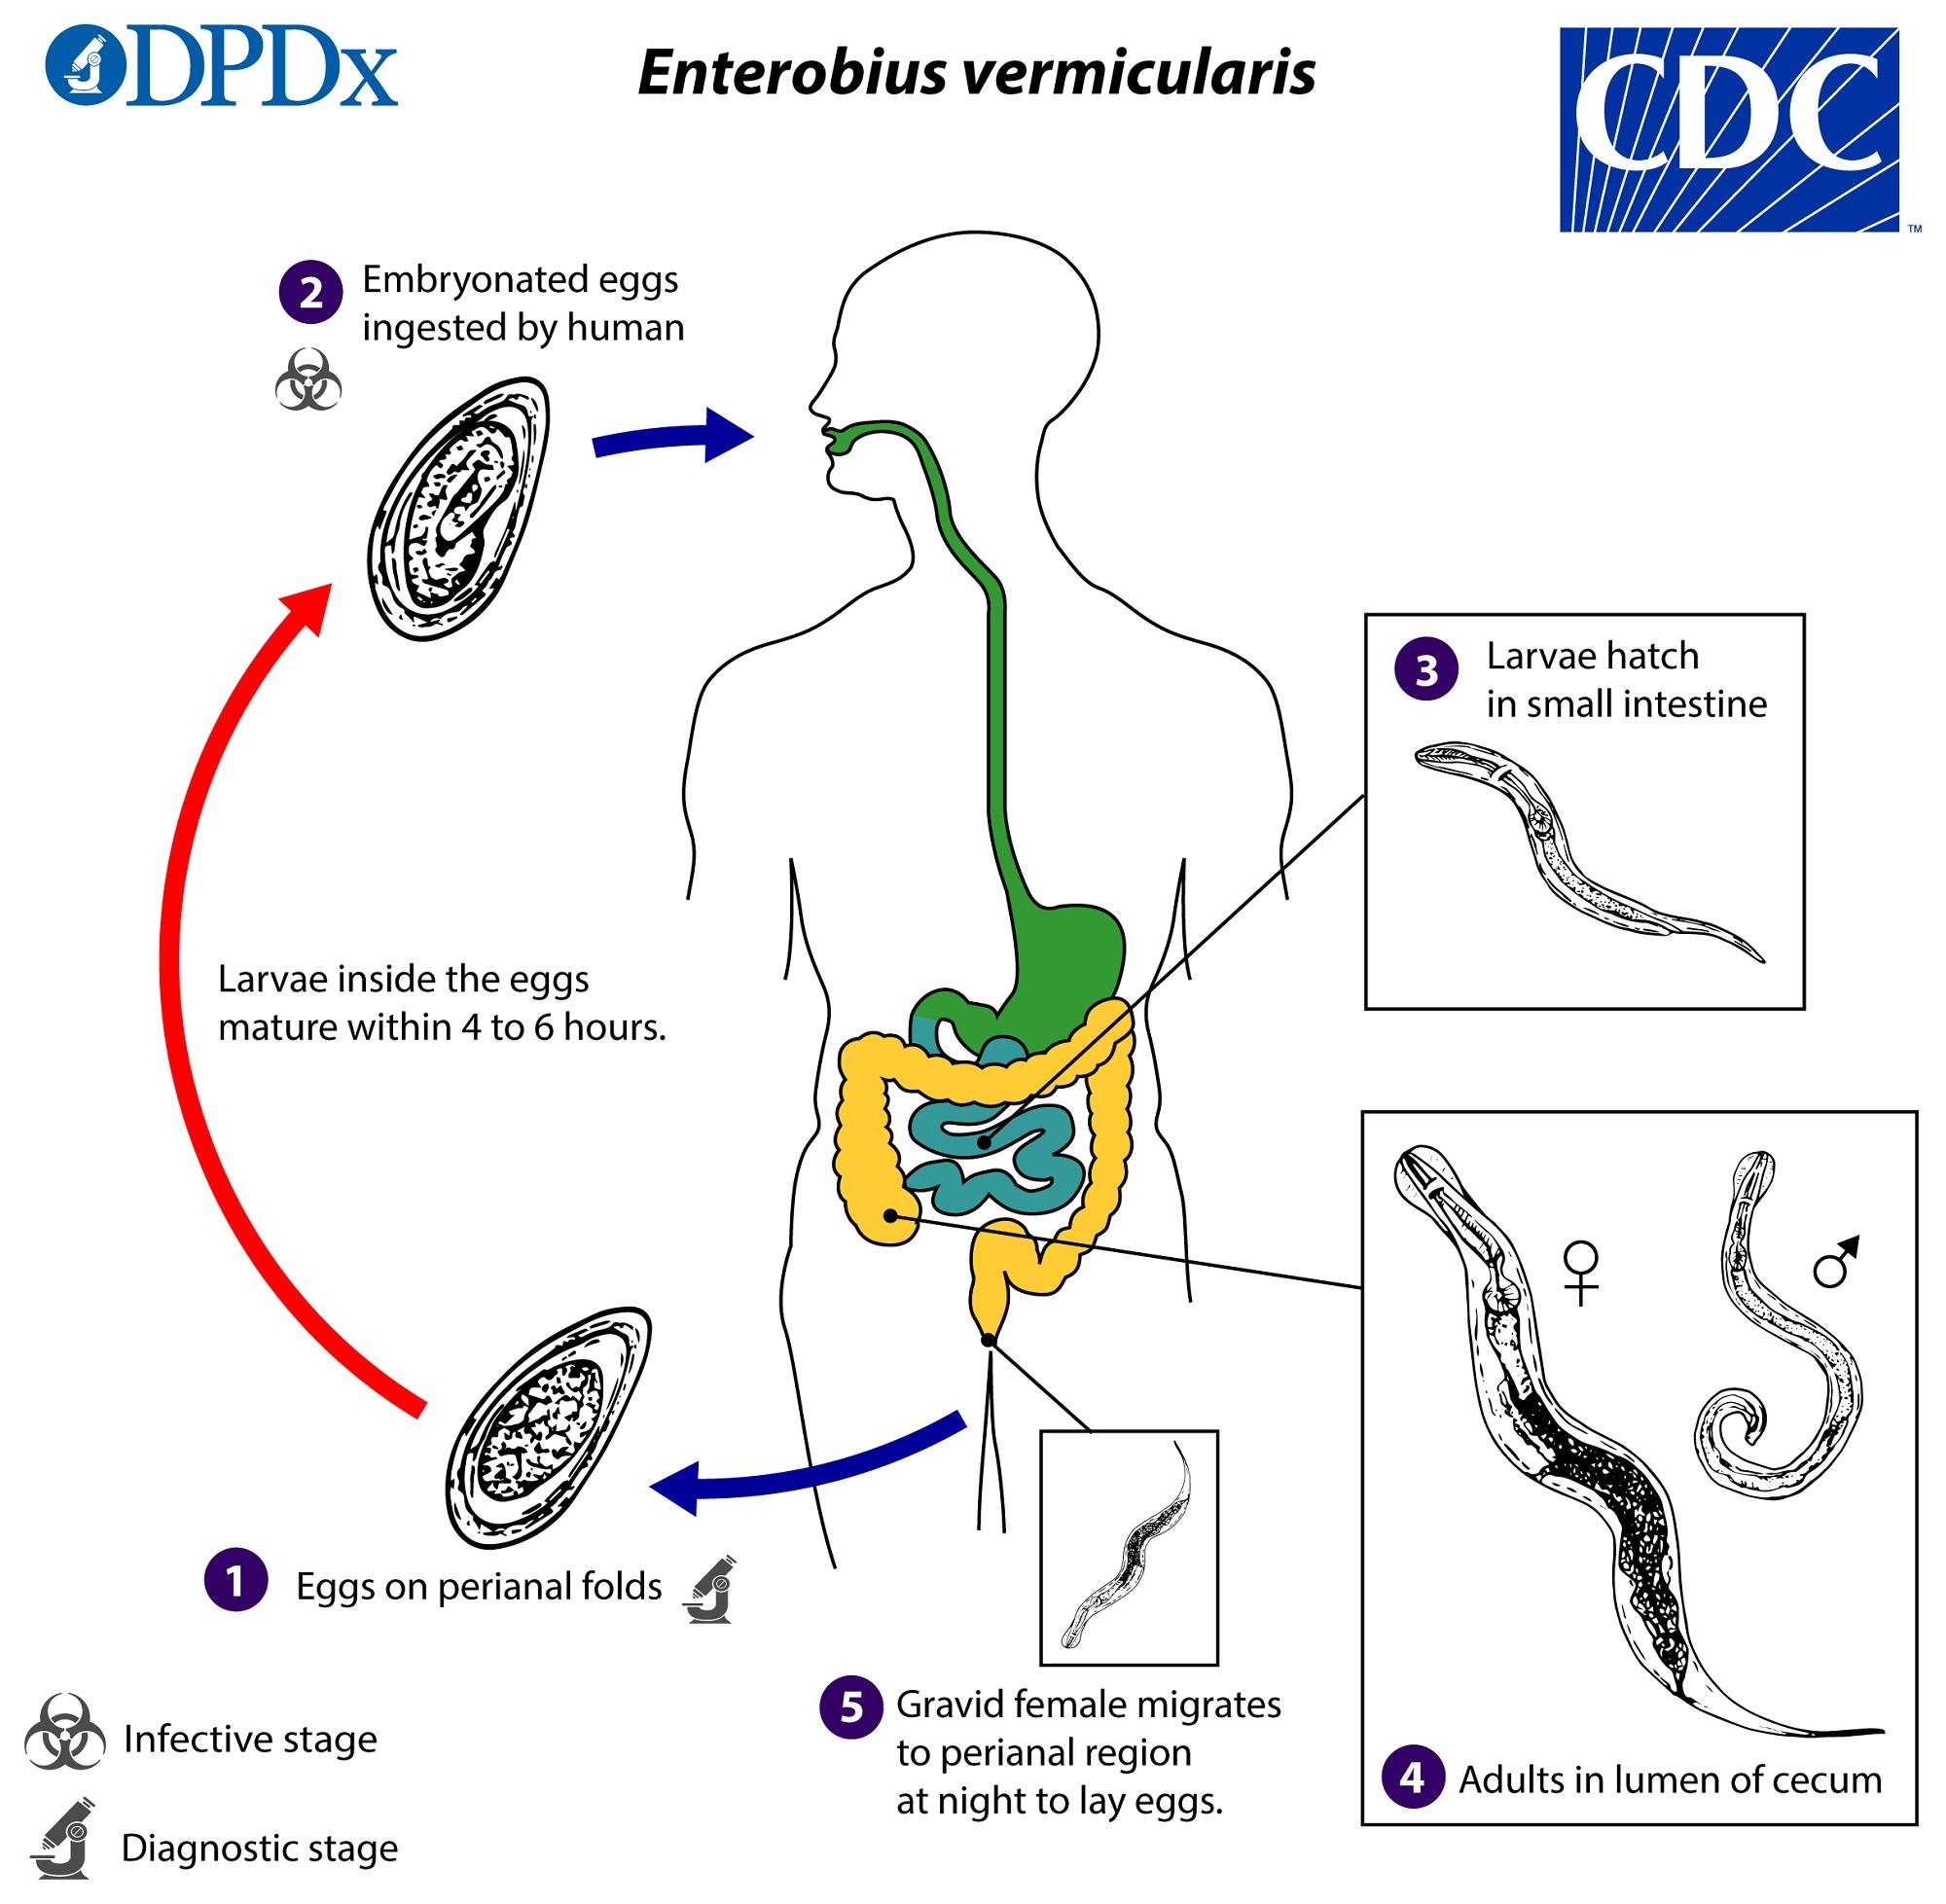 enterobiasis by pinworm